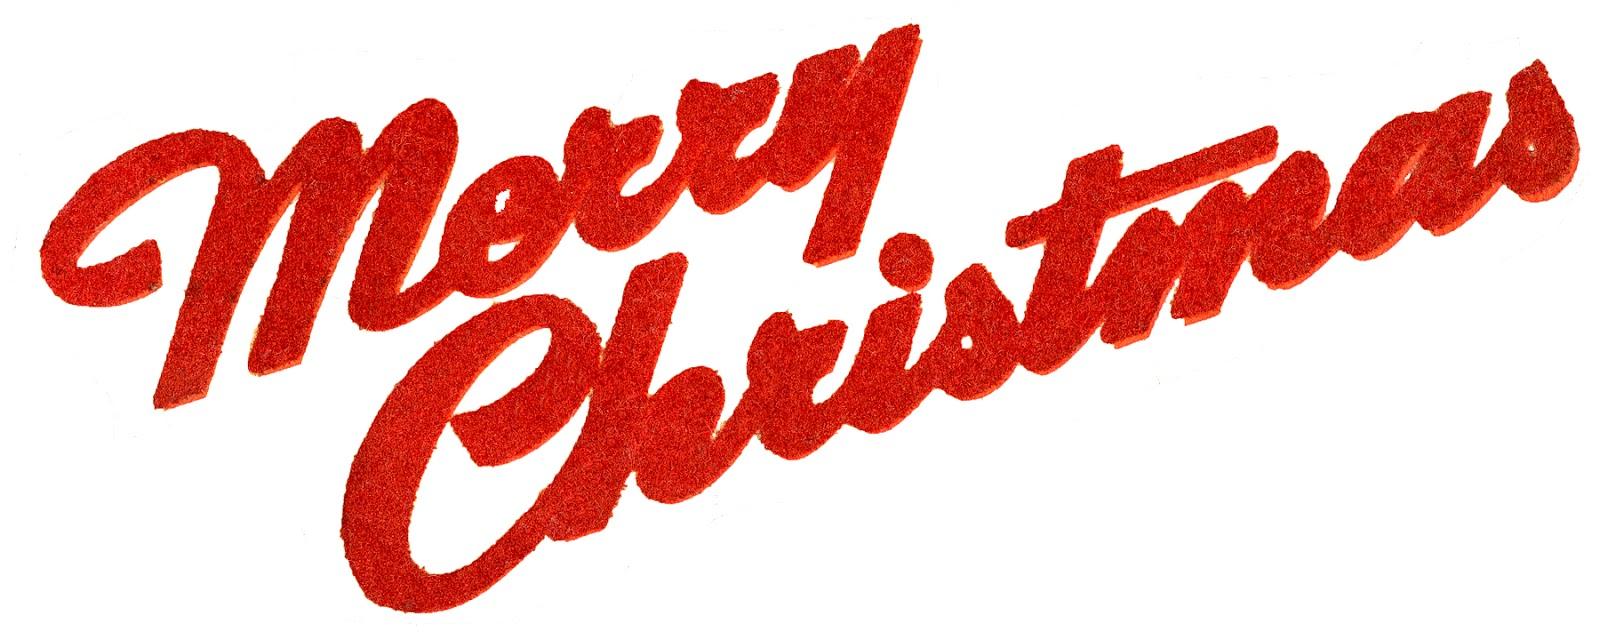 Retro Typography Flocked Merry Christmas The Graphics